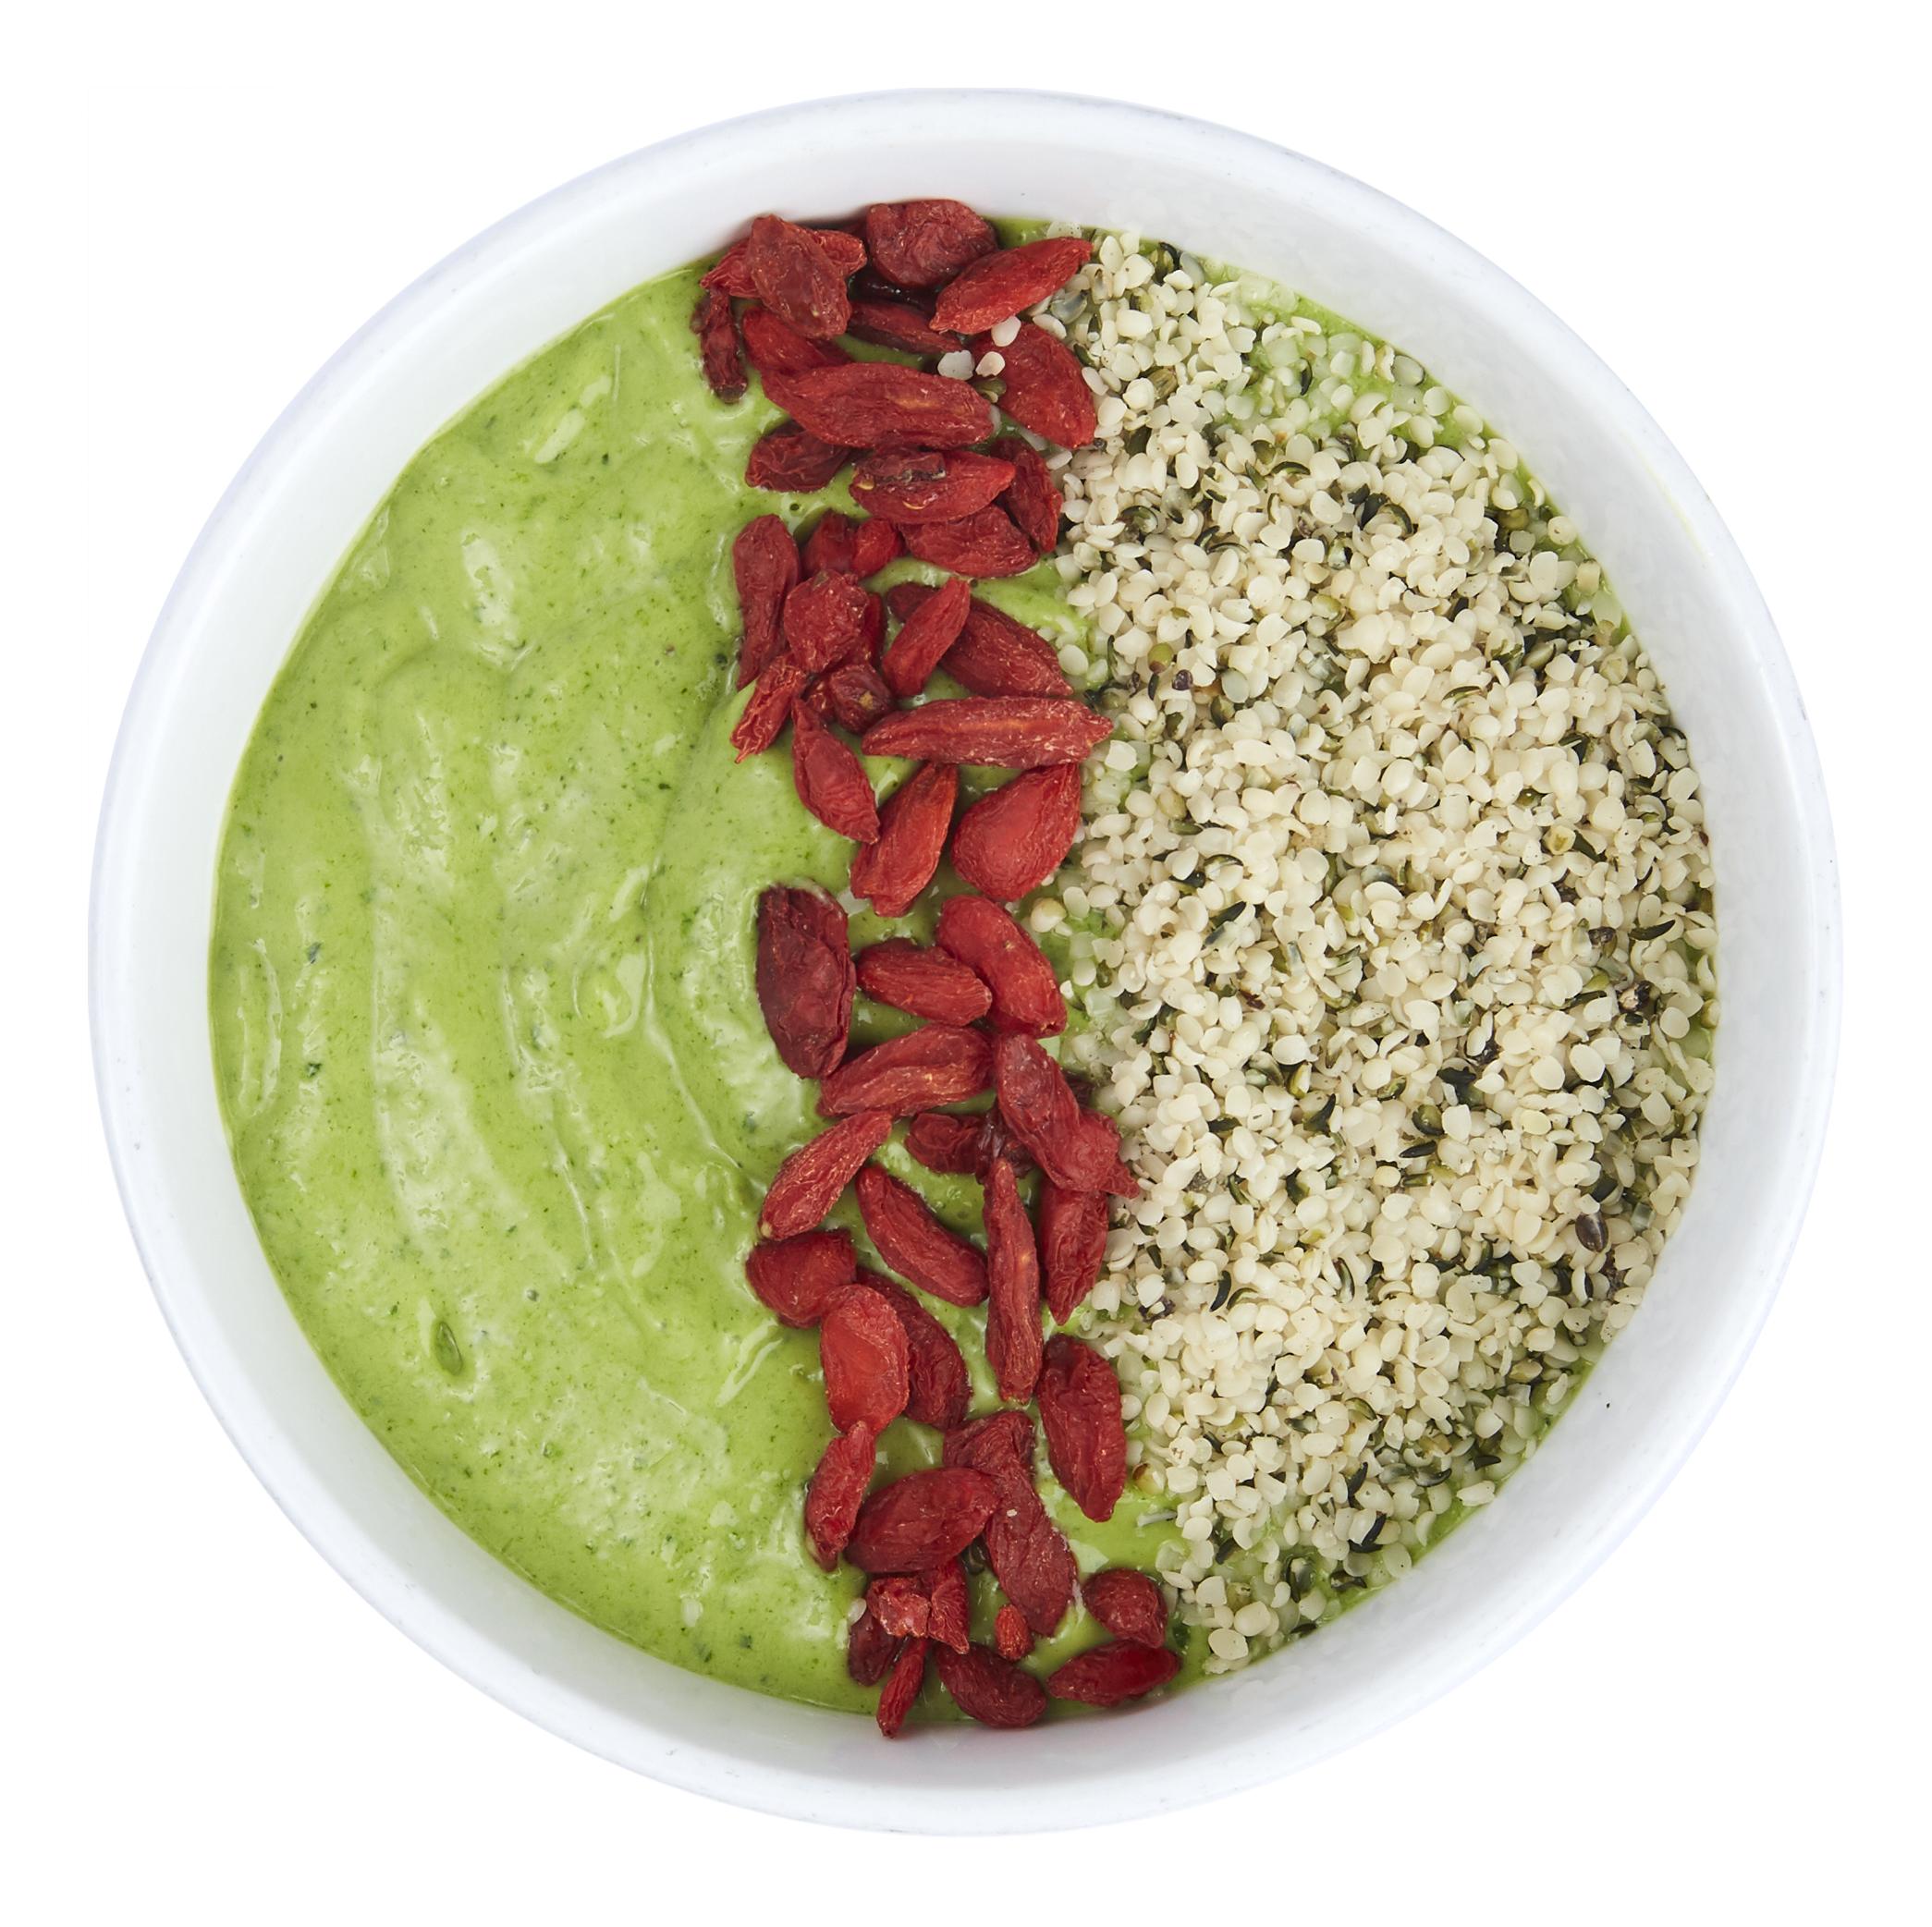 Green Matcha Bowl - $10.50  Banana, kale, spinach, mango, avocado, almond milk.  Toppings: hempseed, goji berry